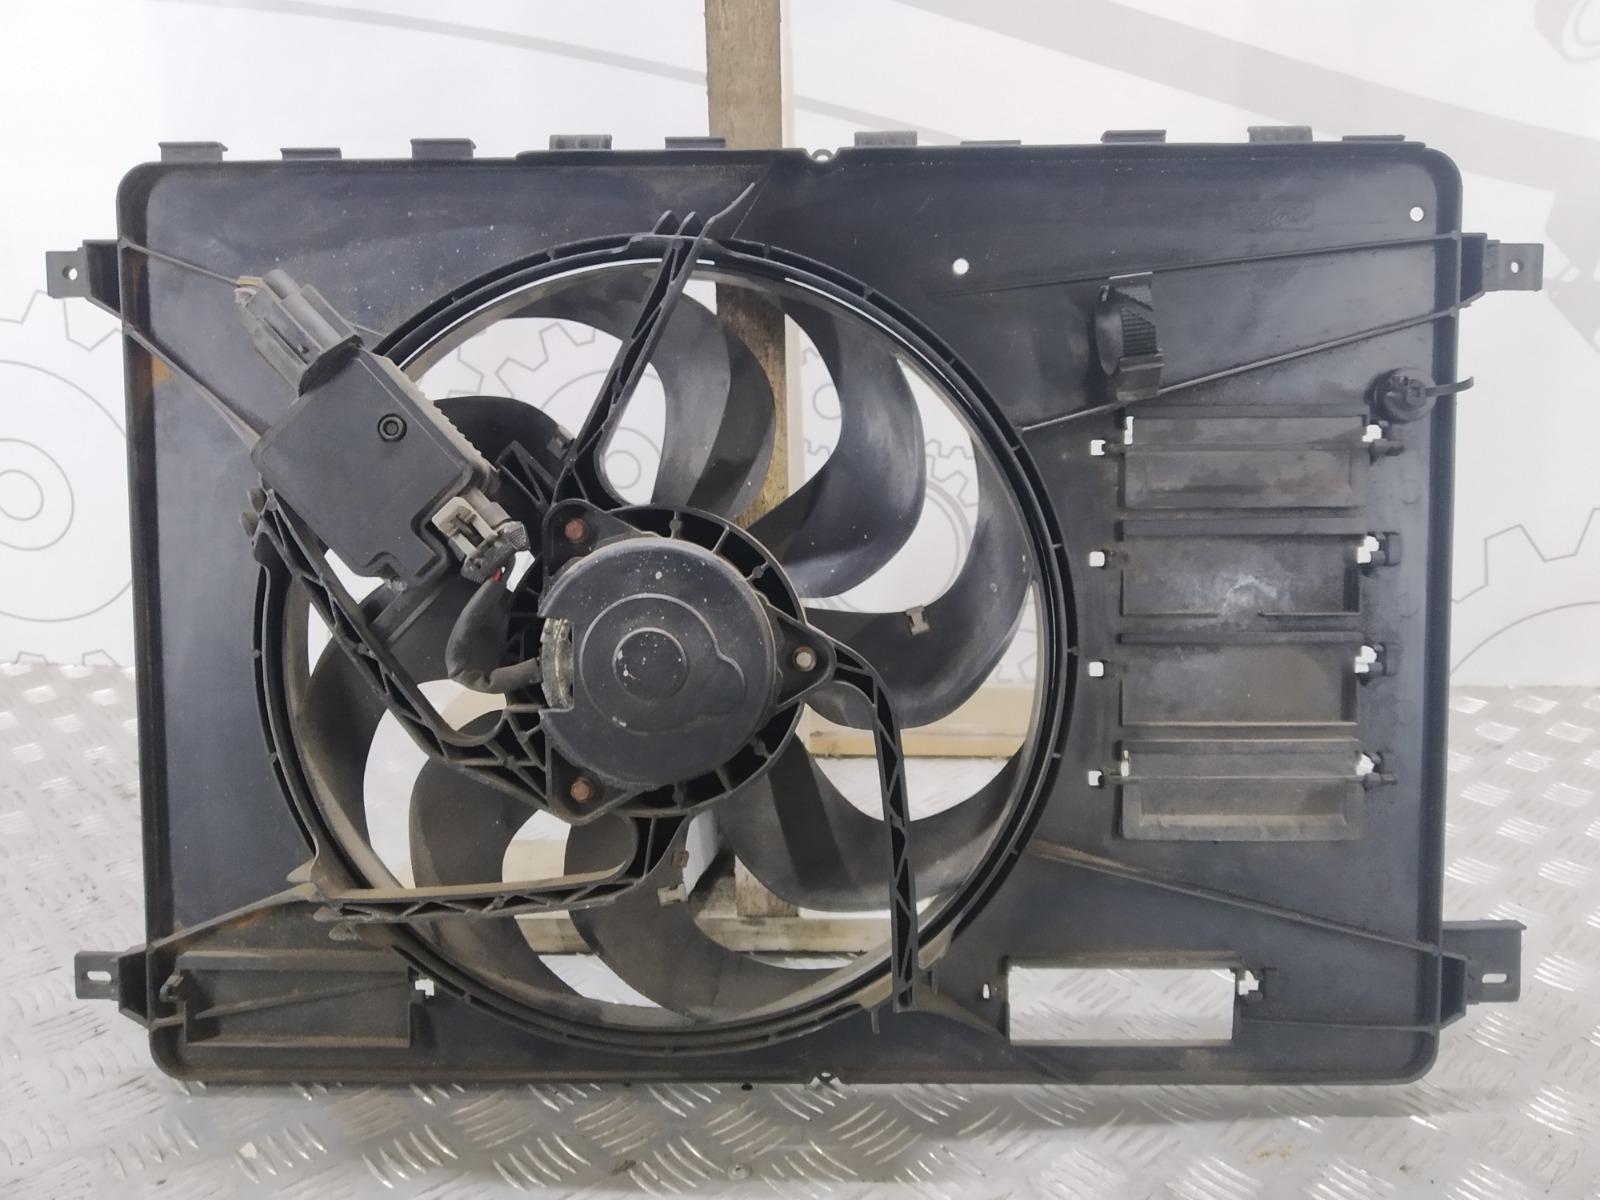 Вентилятор радиатора Ford Mondeo 1.8 TDCI 2008 (б/у)